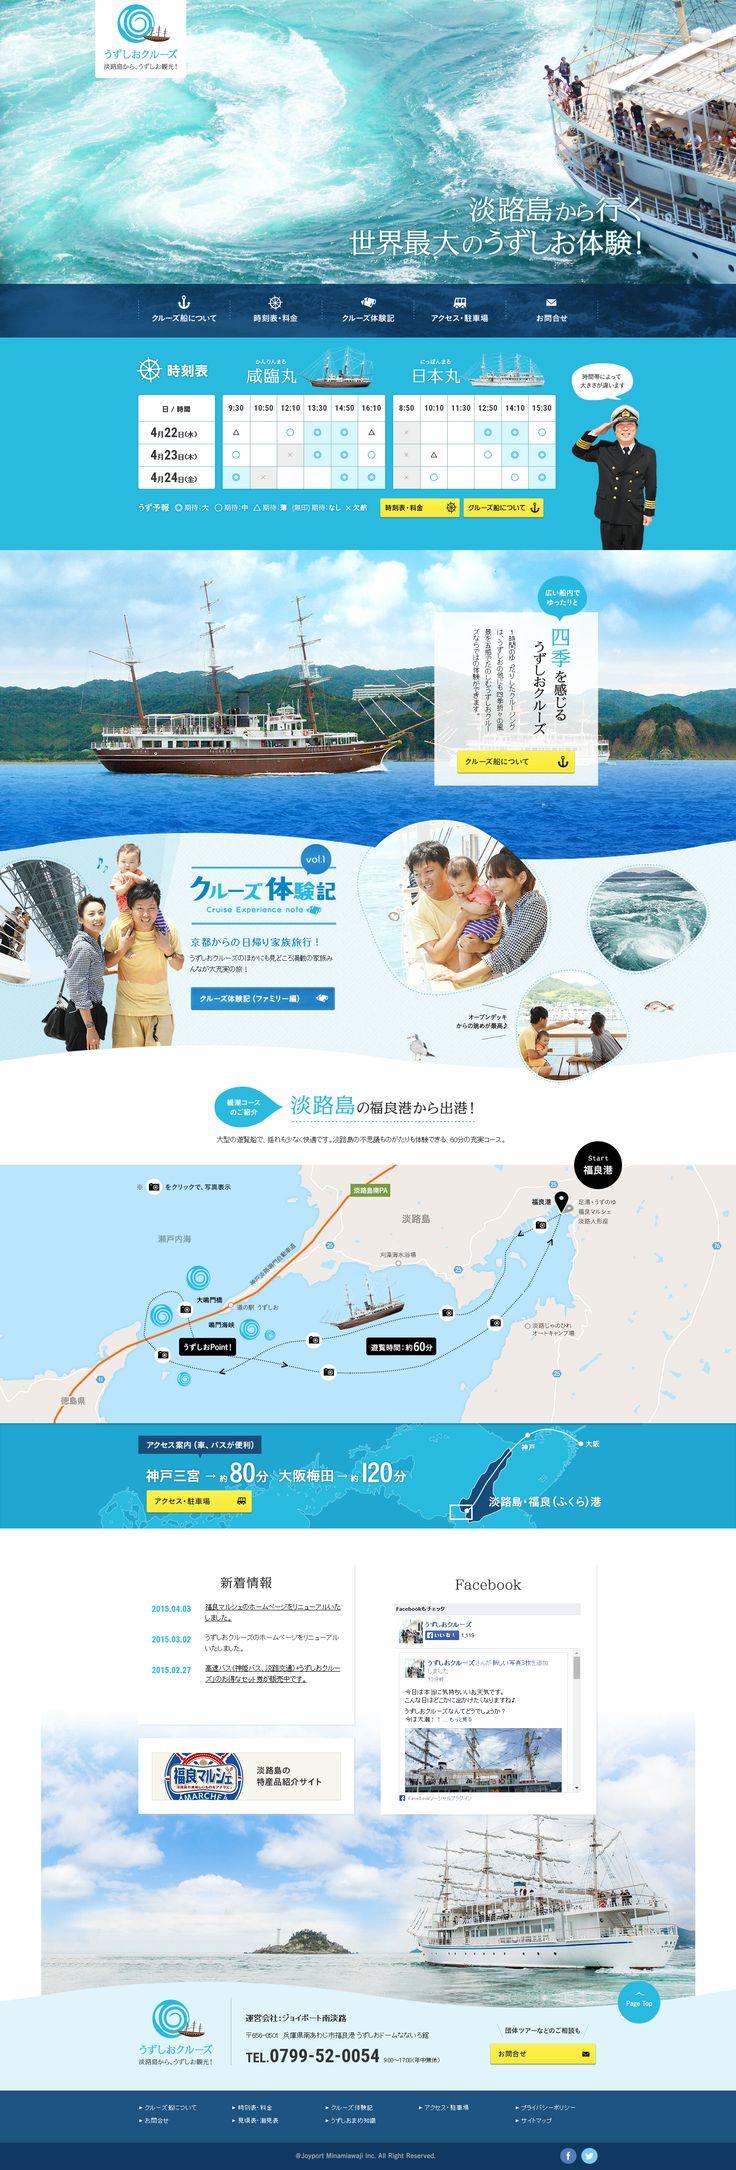 http://www.uzu-shio.com/ | Lp デザイン, ウェブデザイン, 旅行